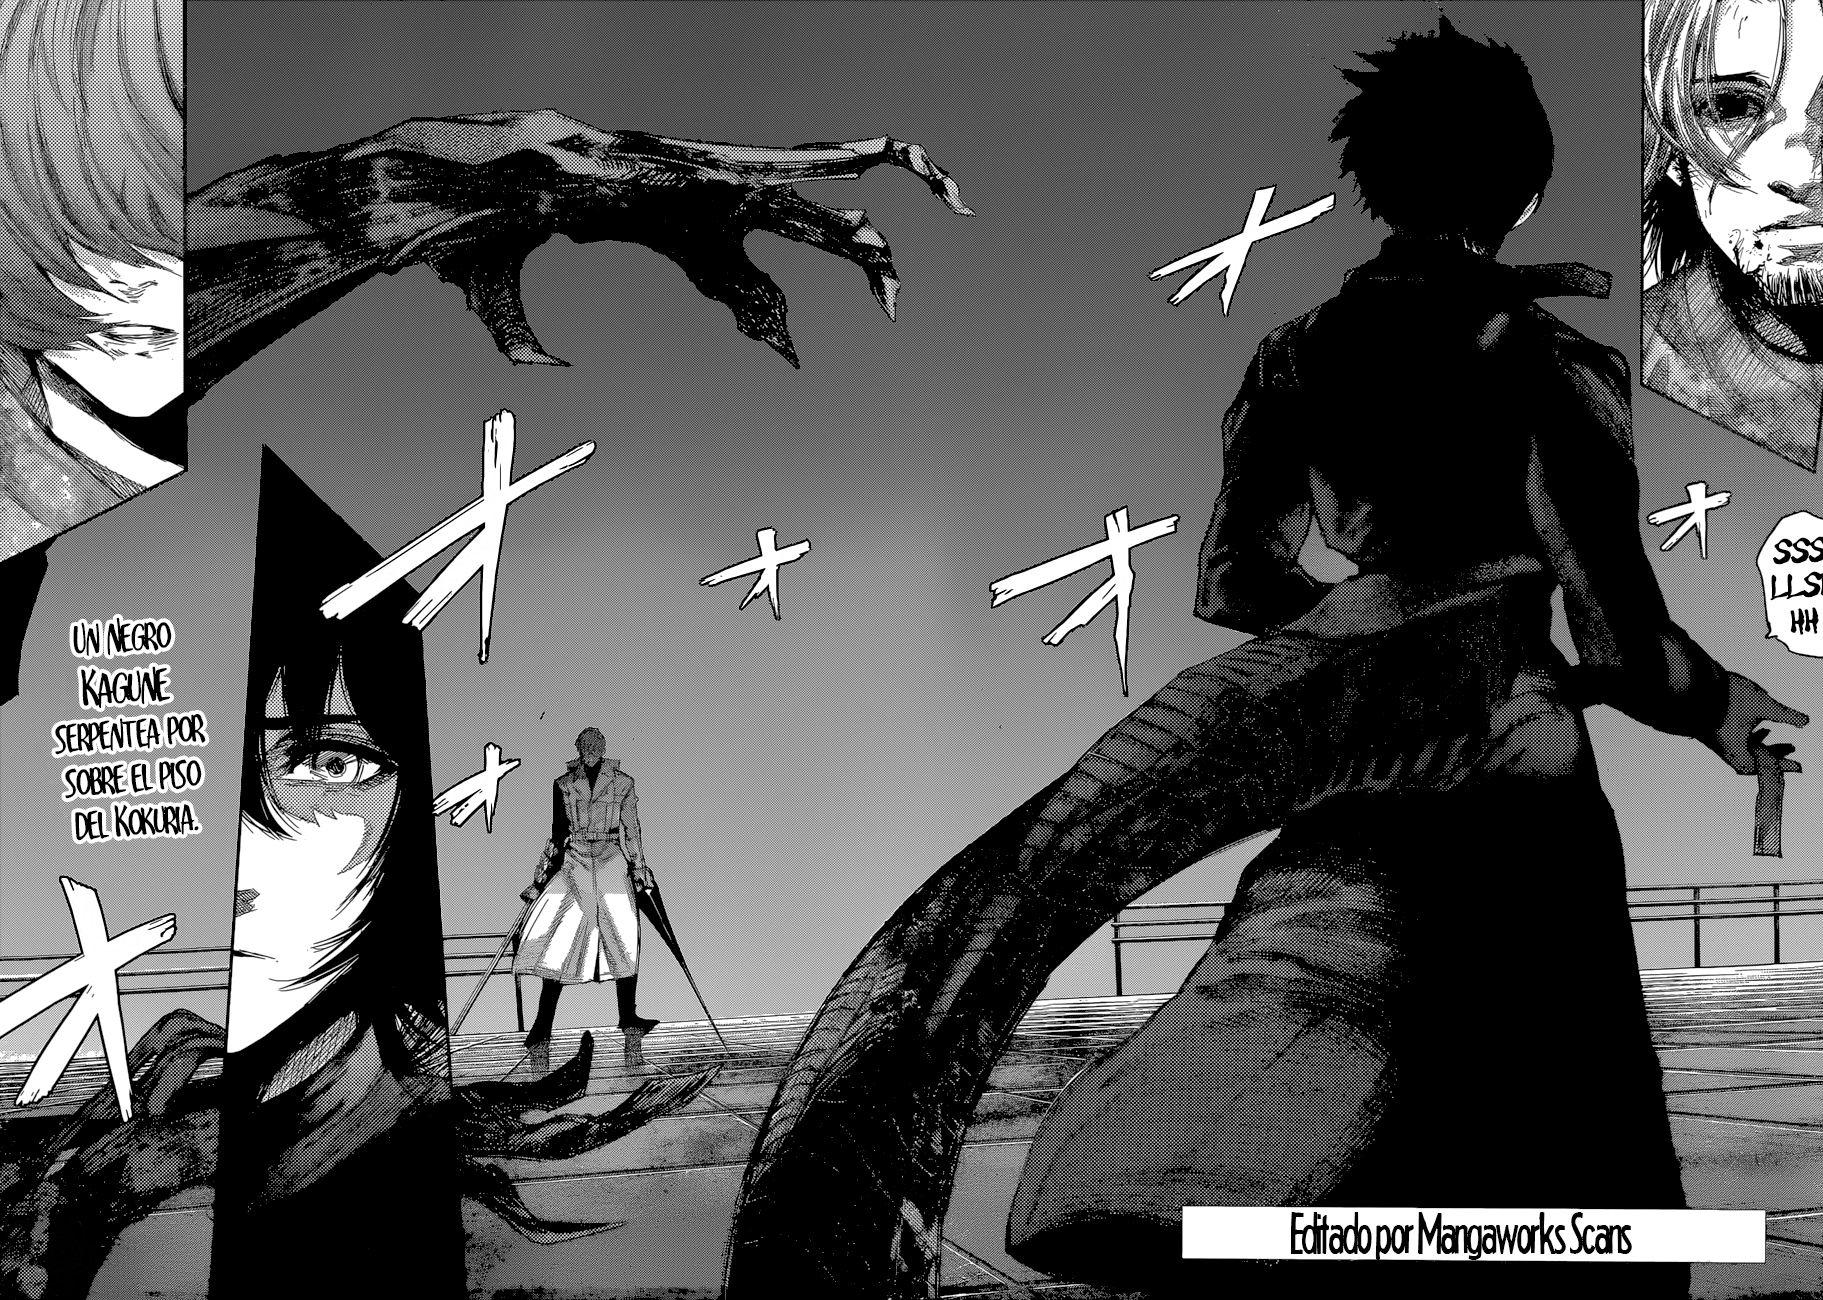 http://c5.ninemanga.com/es_manga/59/59/454635/9de6f2fcd6b33386b42e2aa5e19bb4da.jpg Page 4